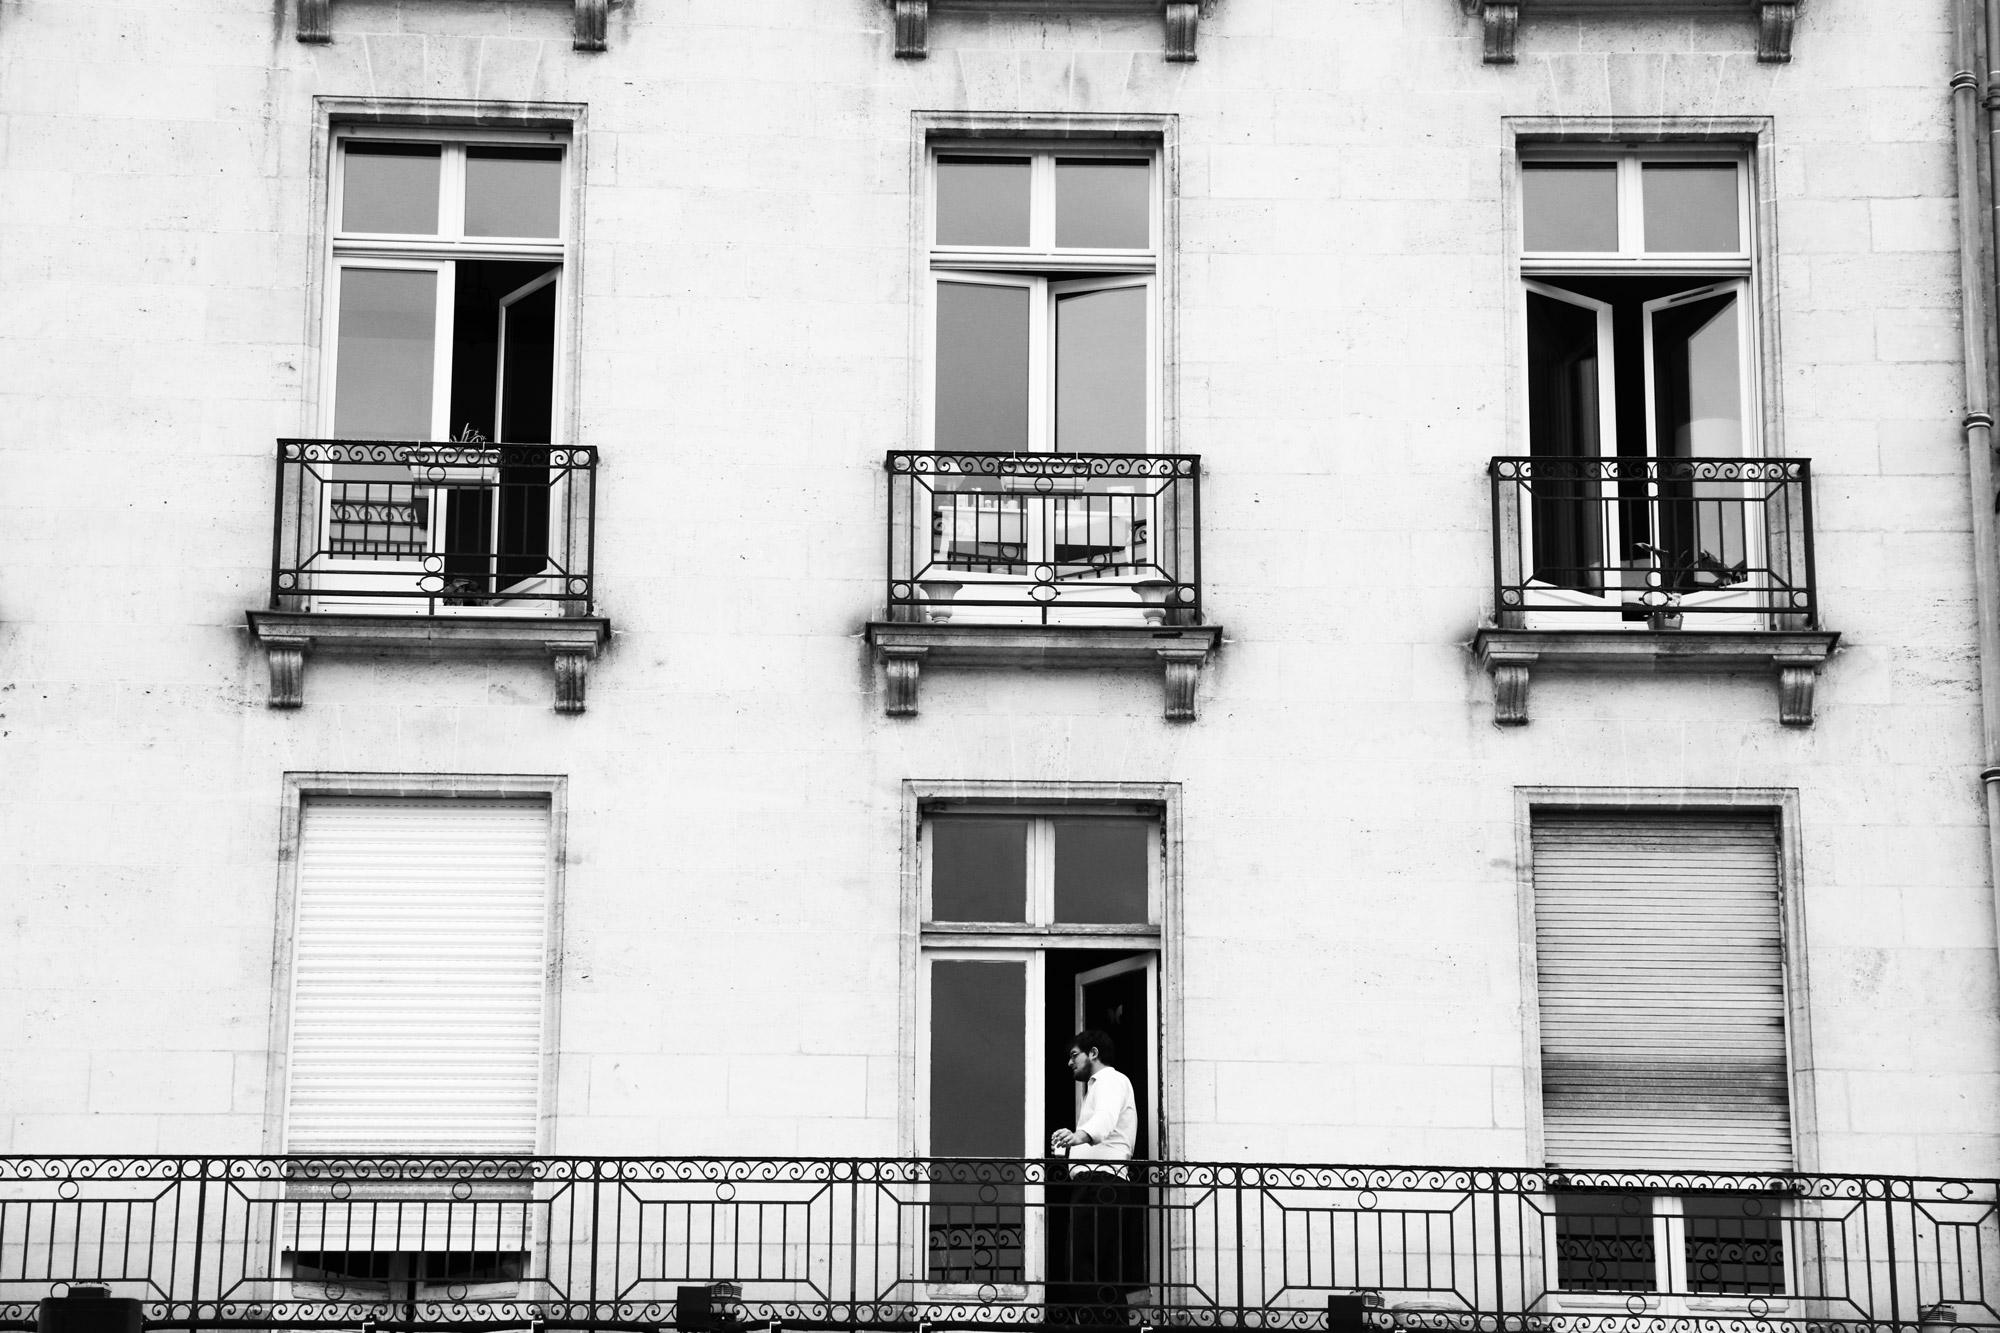 """Windows 6"" - Place Royale, Nantes. ©Clémence Rougetet"